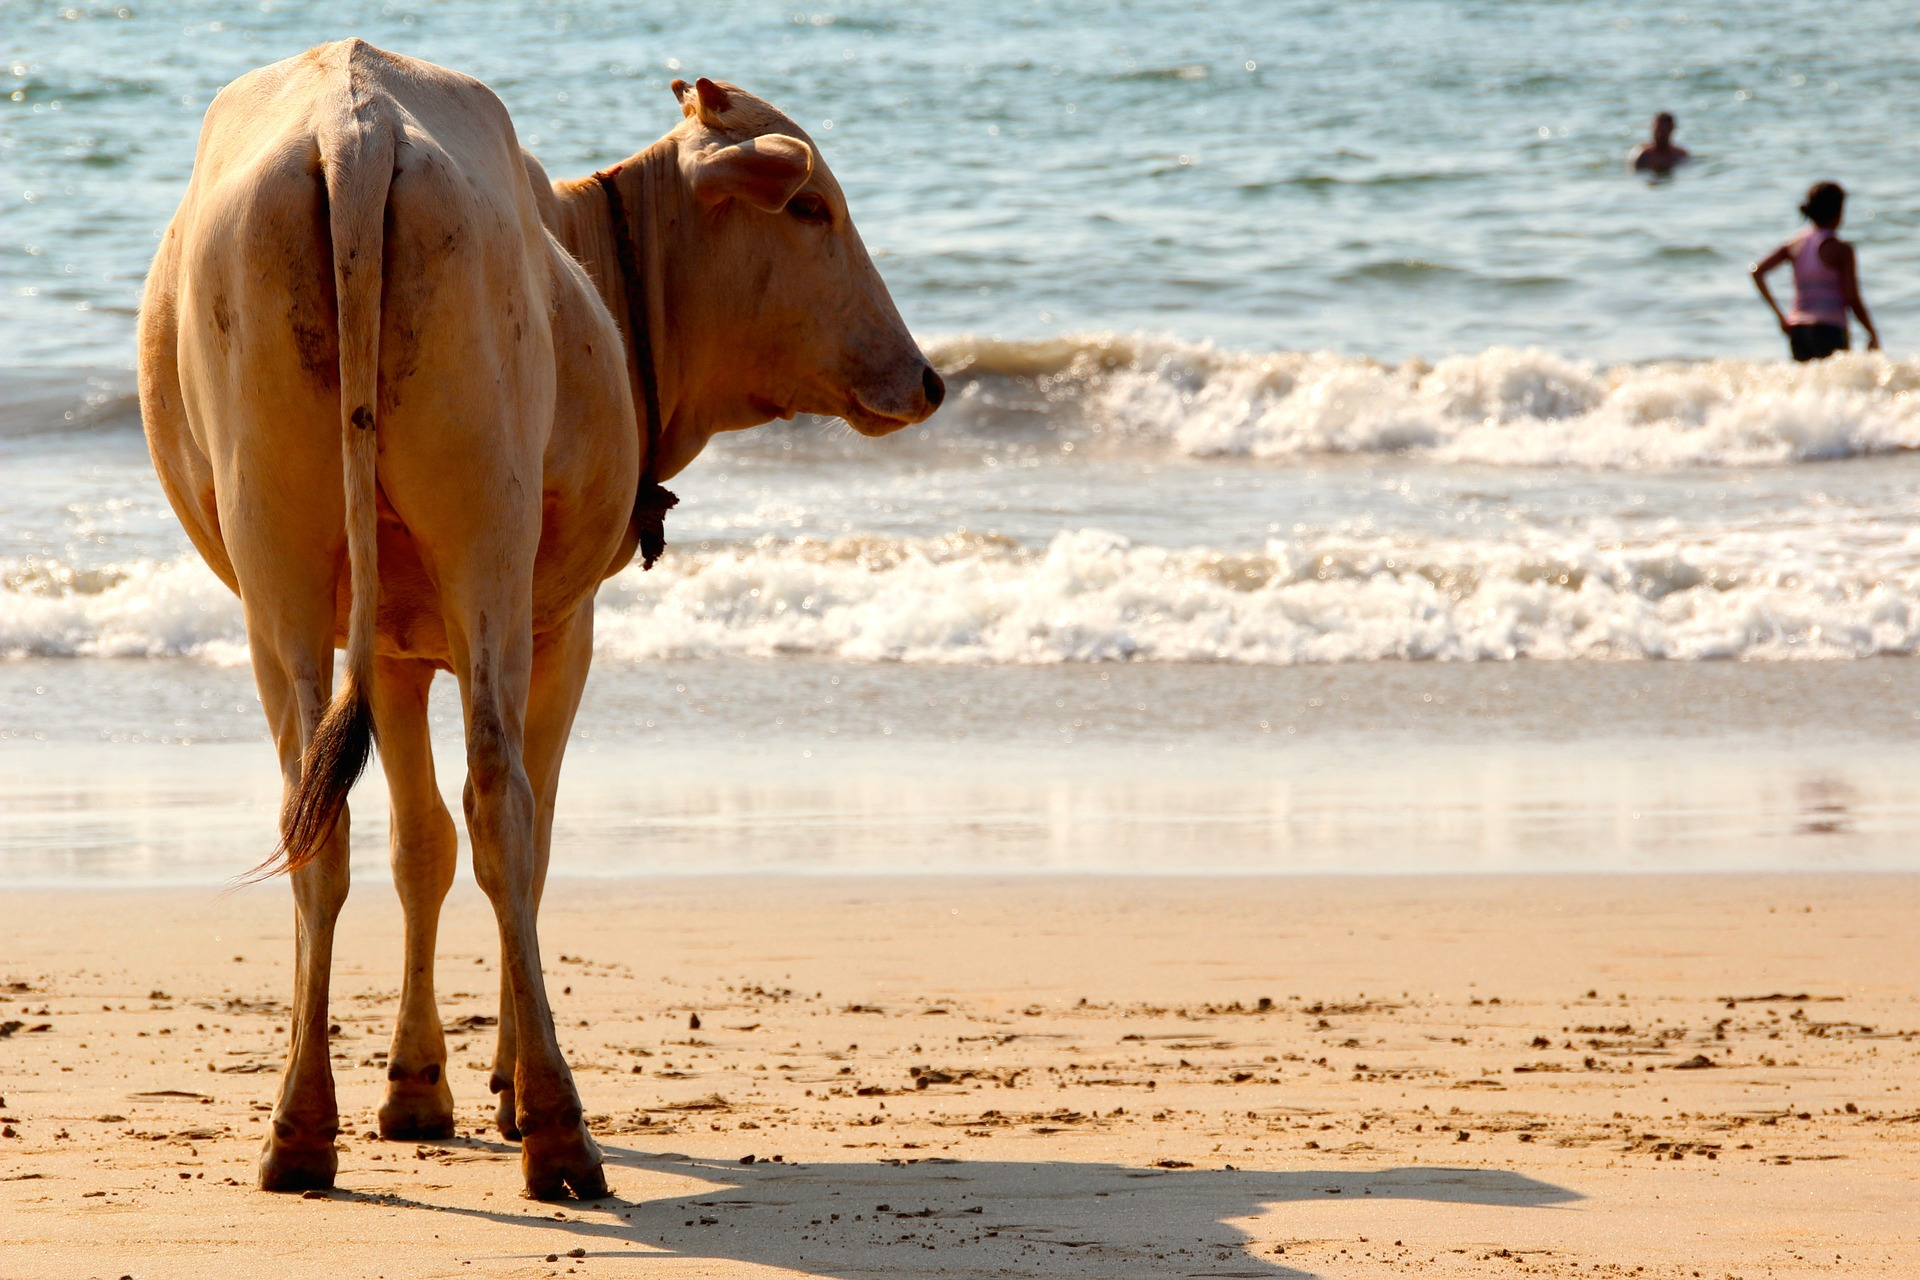 Goa_plage_CC0.jpg?1544882395